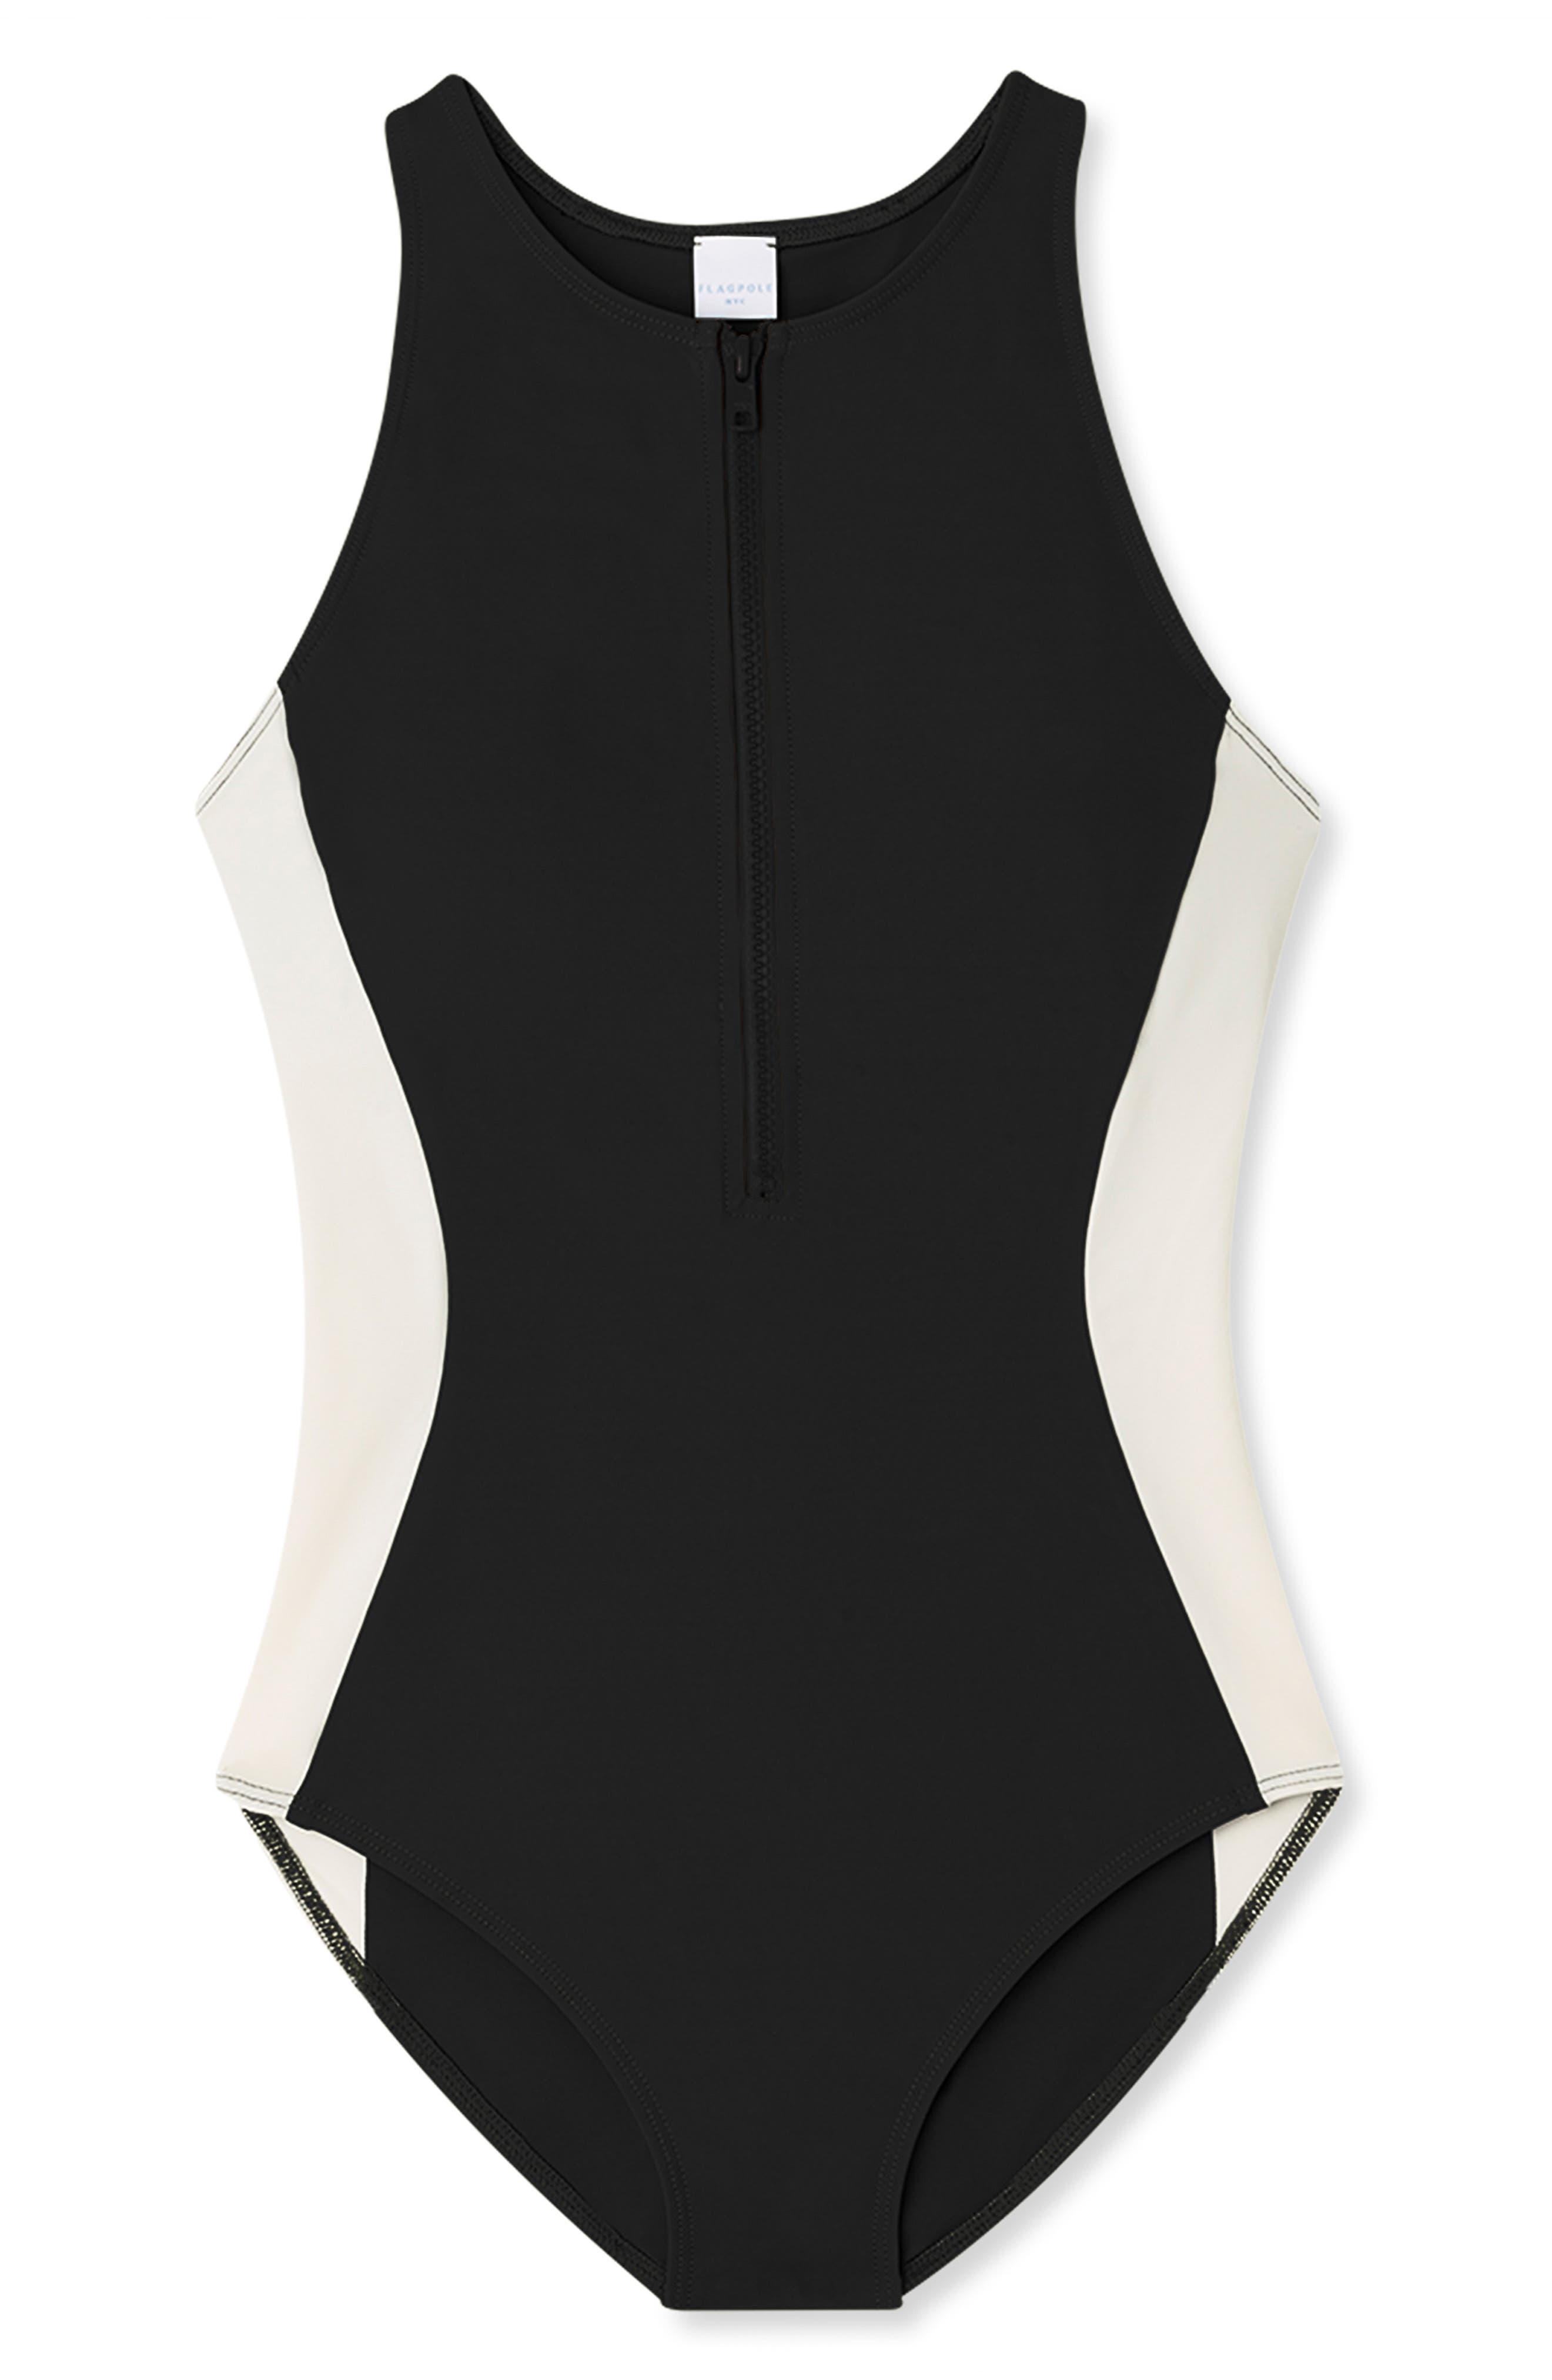 FLAGPOLE Stella One-Piece Swimsuit in Black/ Lychee